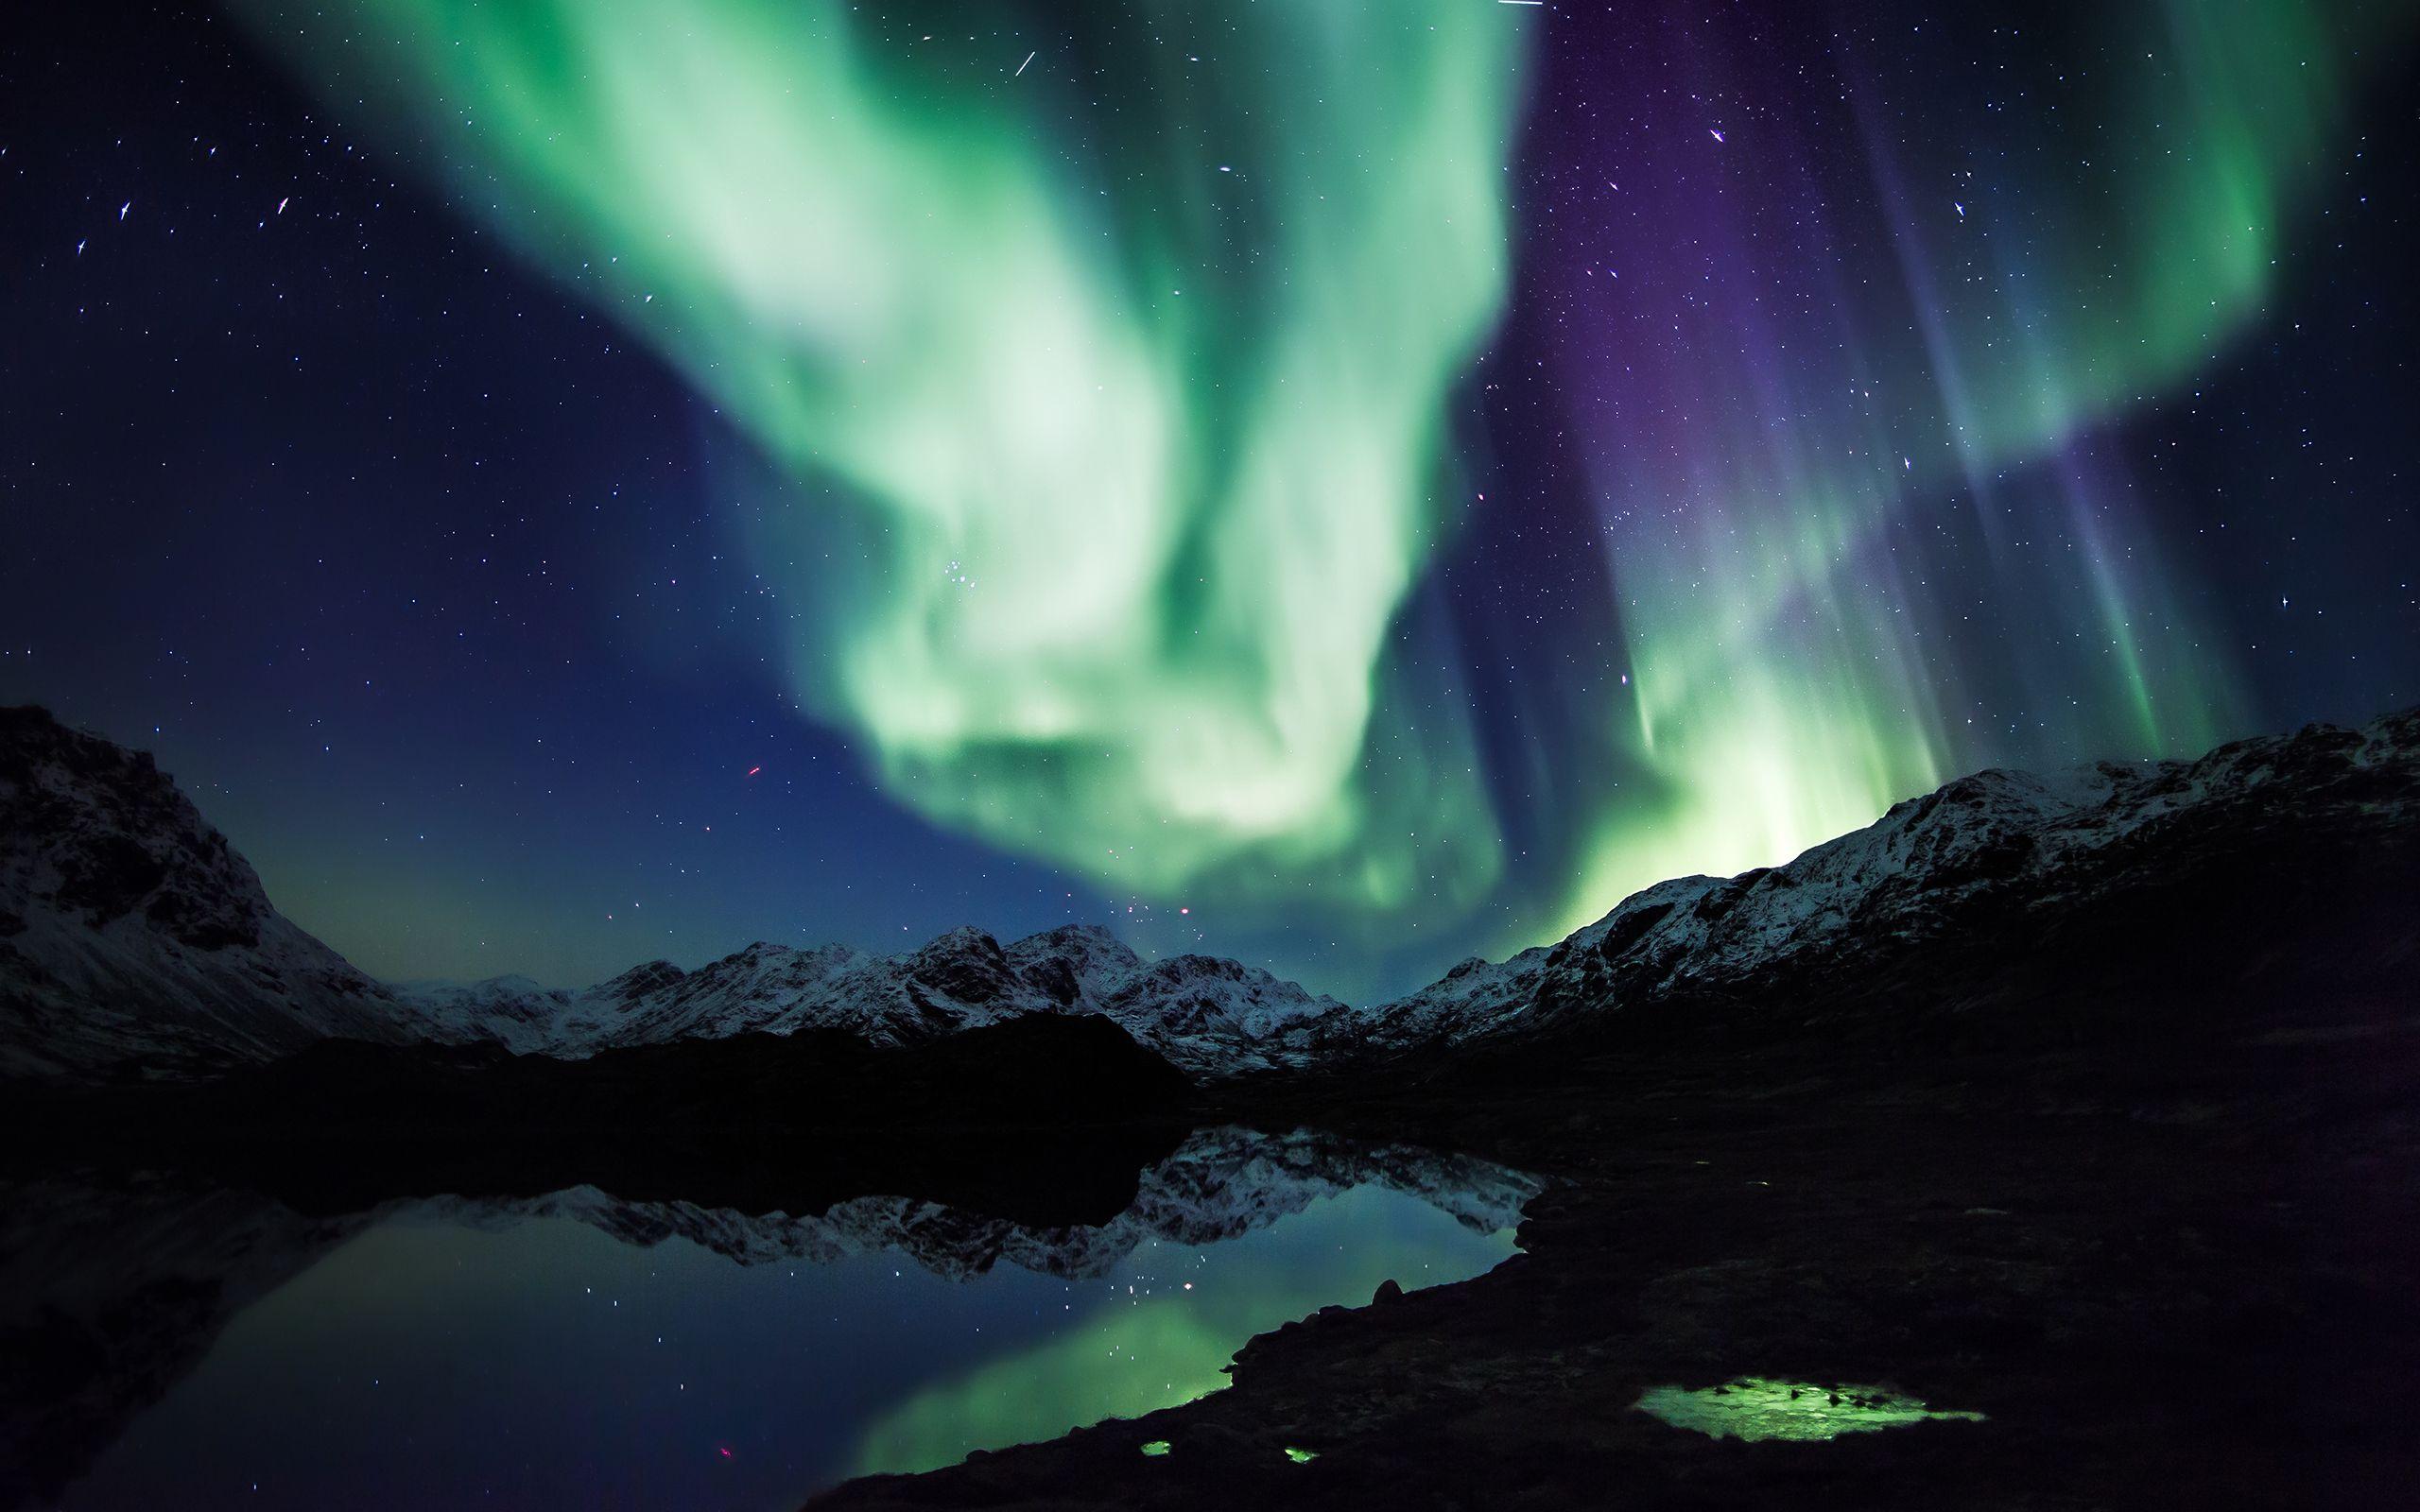 Aurora Borealis wallpaper - 1207999